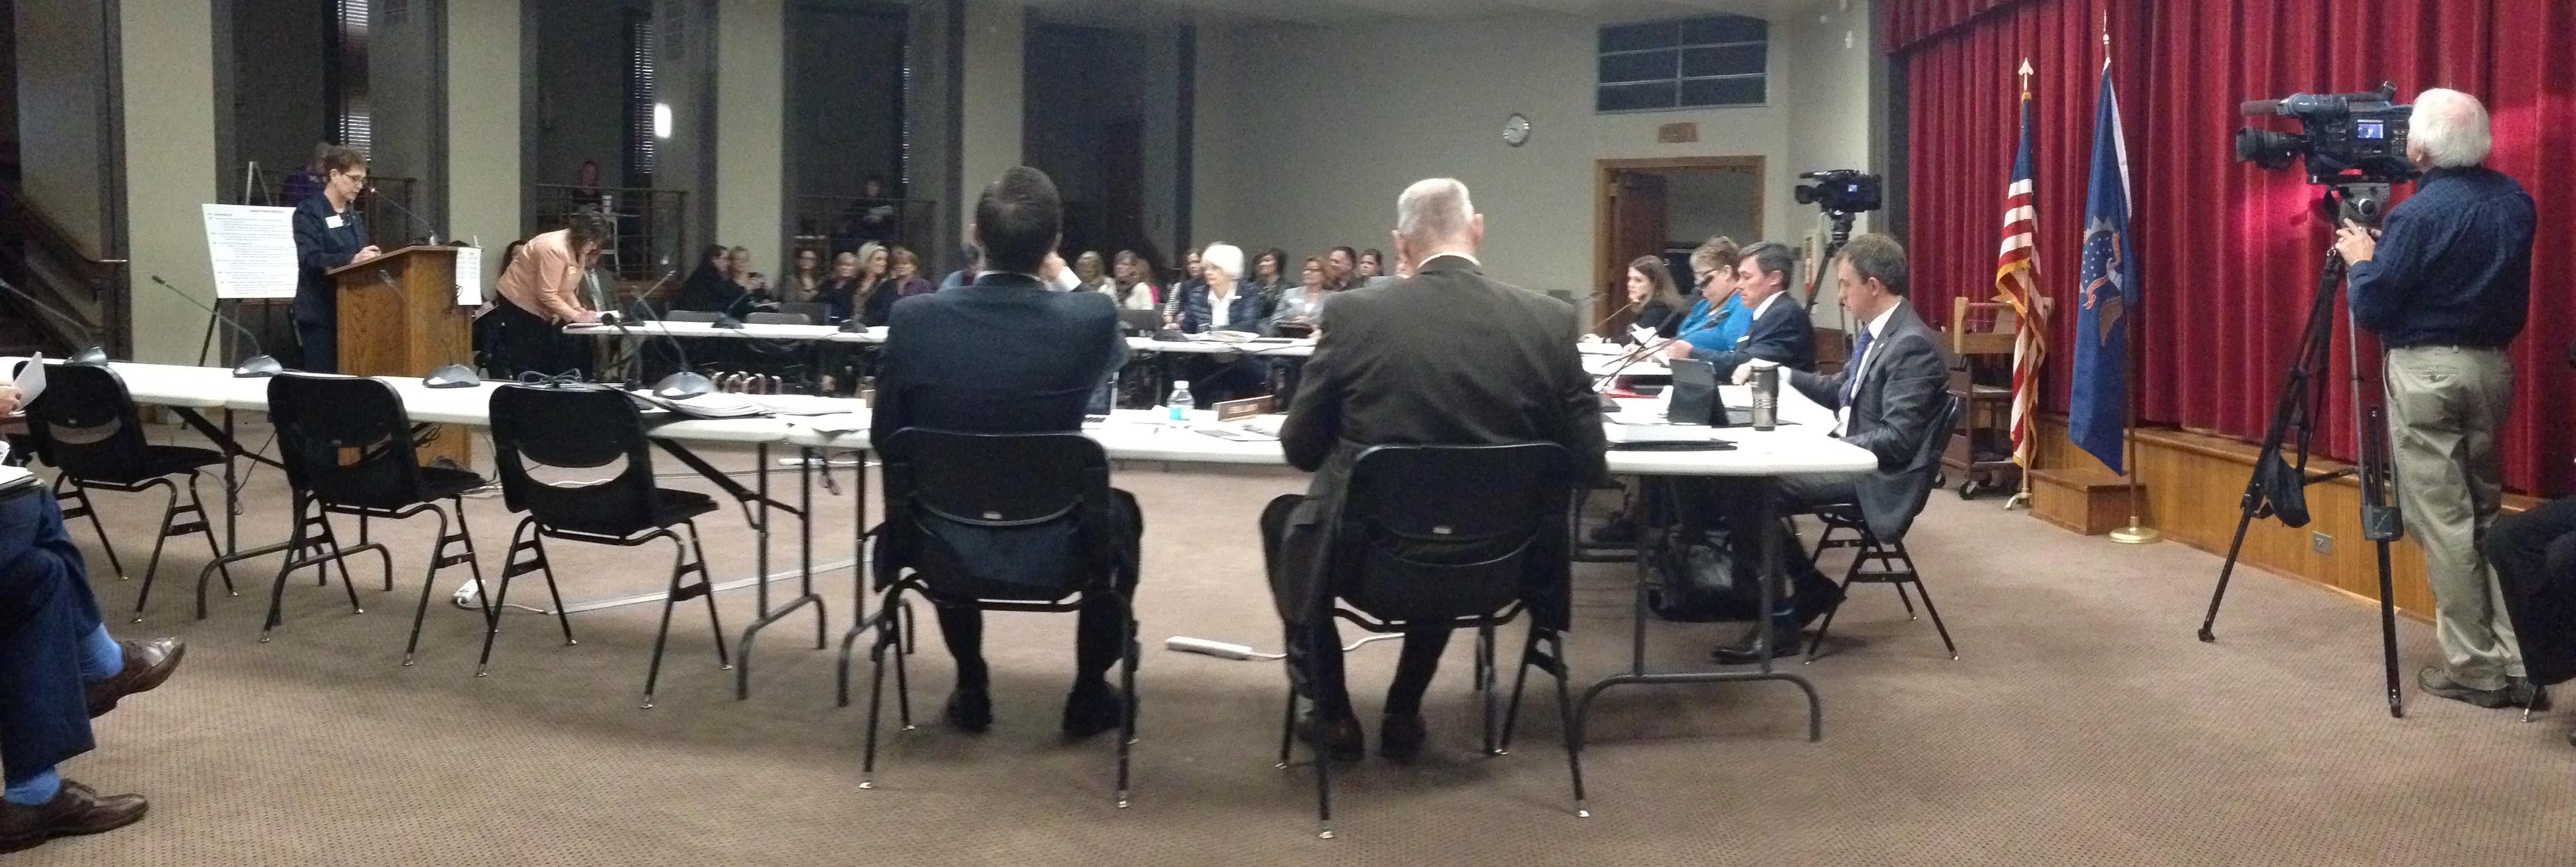 Lin Sex Trafficking testimony Jan 28 2015 c